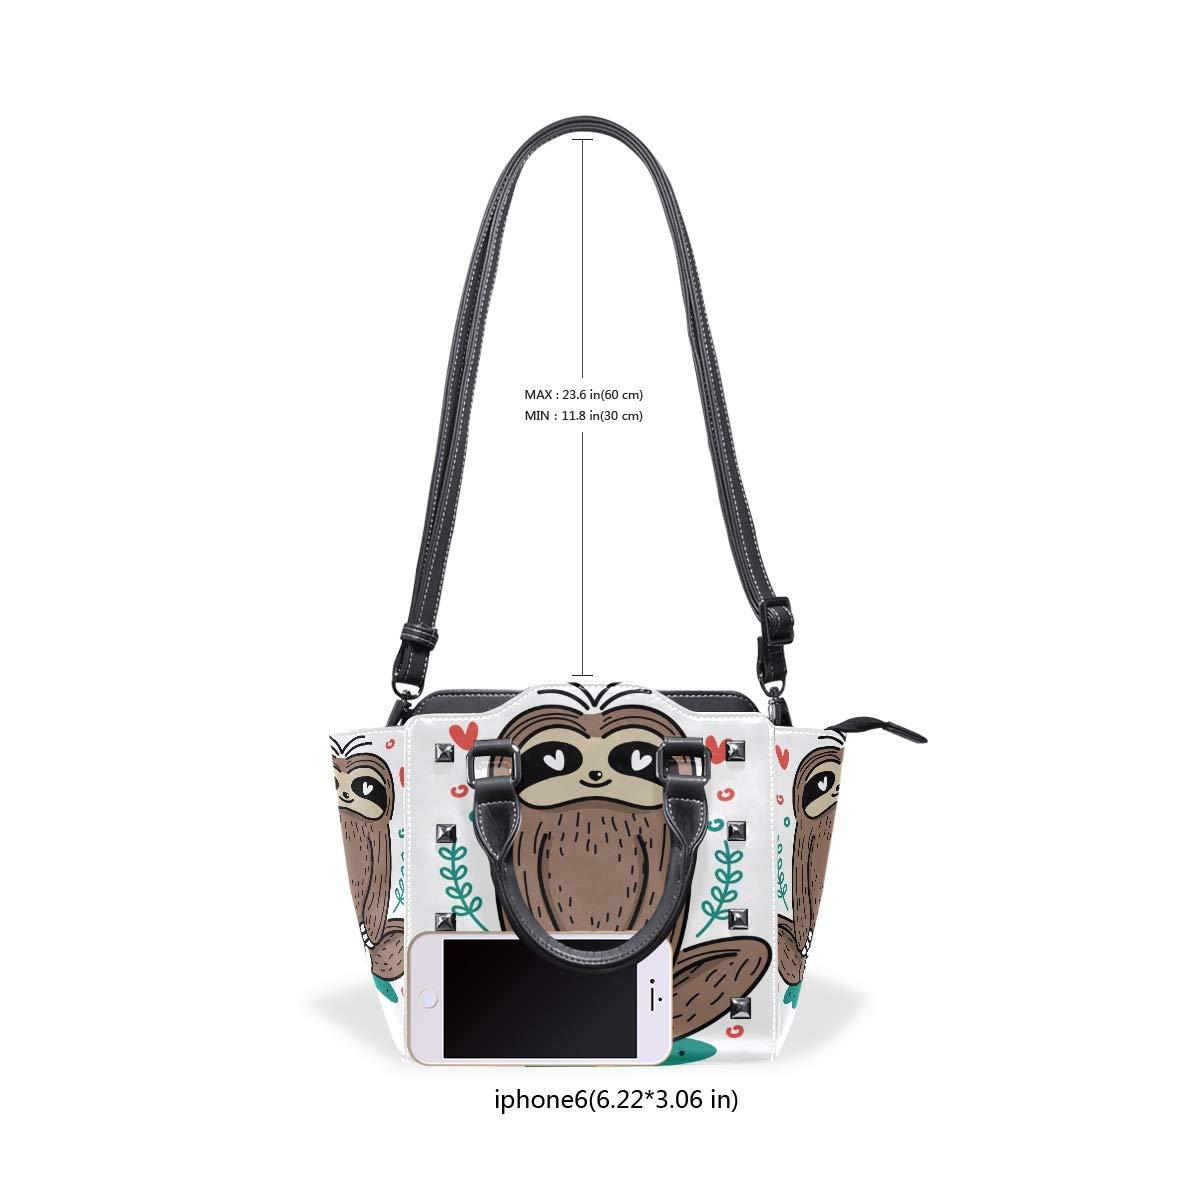 imobaby Cute Yoga Sloth PU Leather Girls Top-Handle Handbags Single-Shoulder Ladies Tote Crossbody Bag Messenger Bags For Women